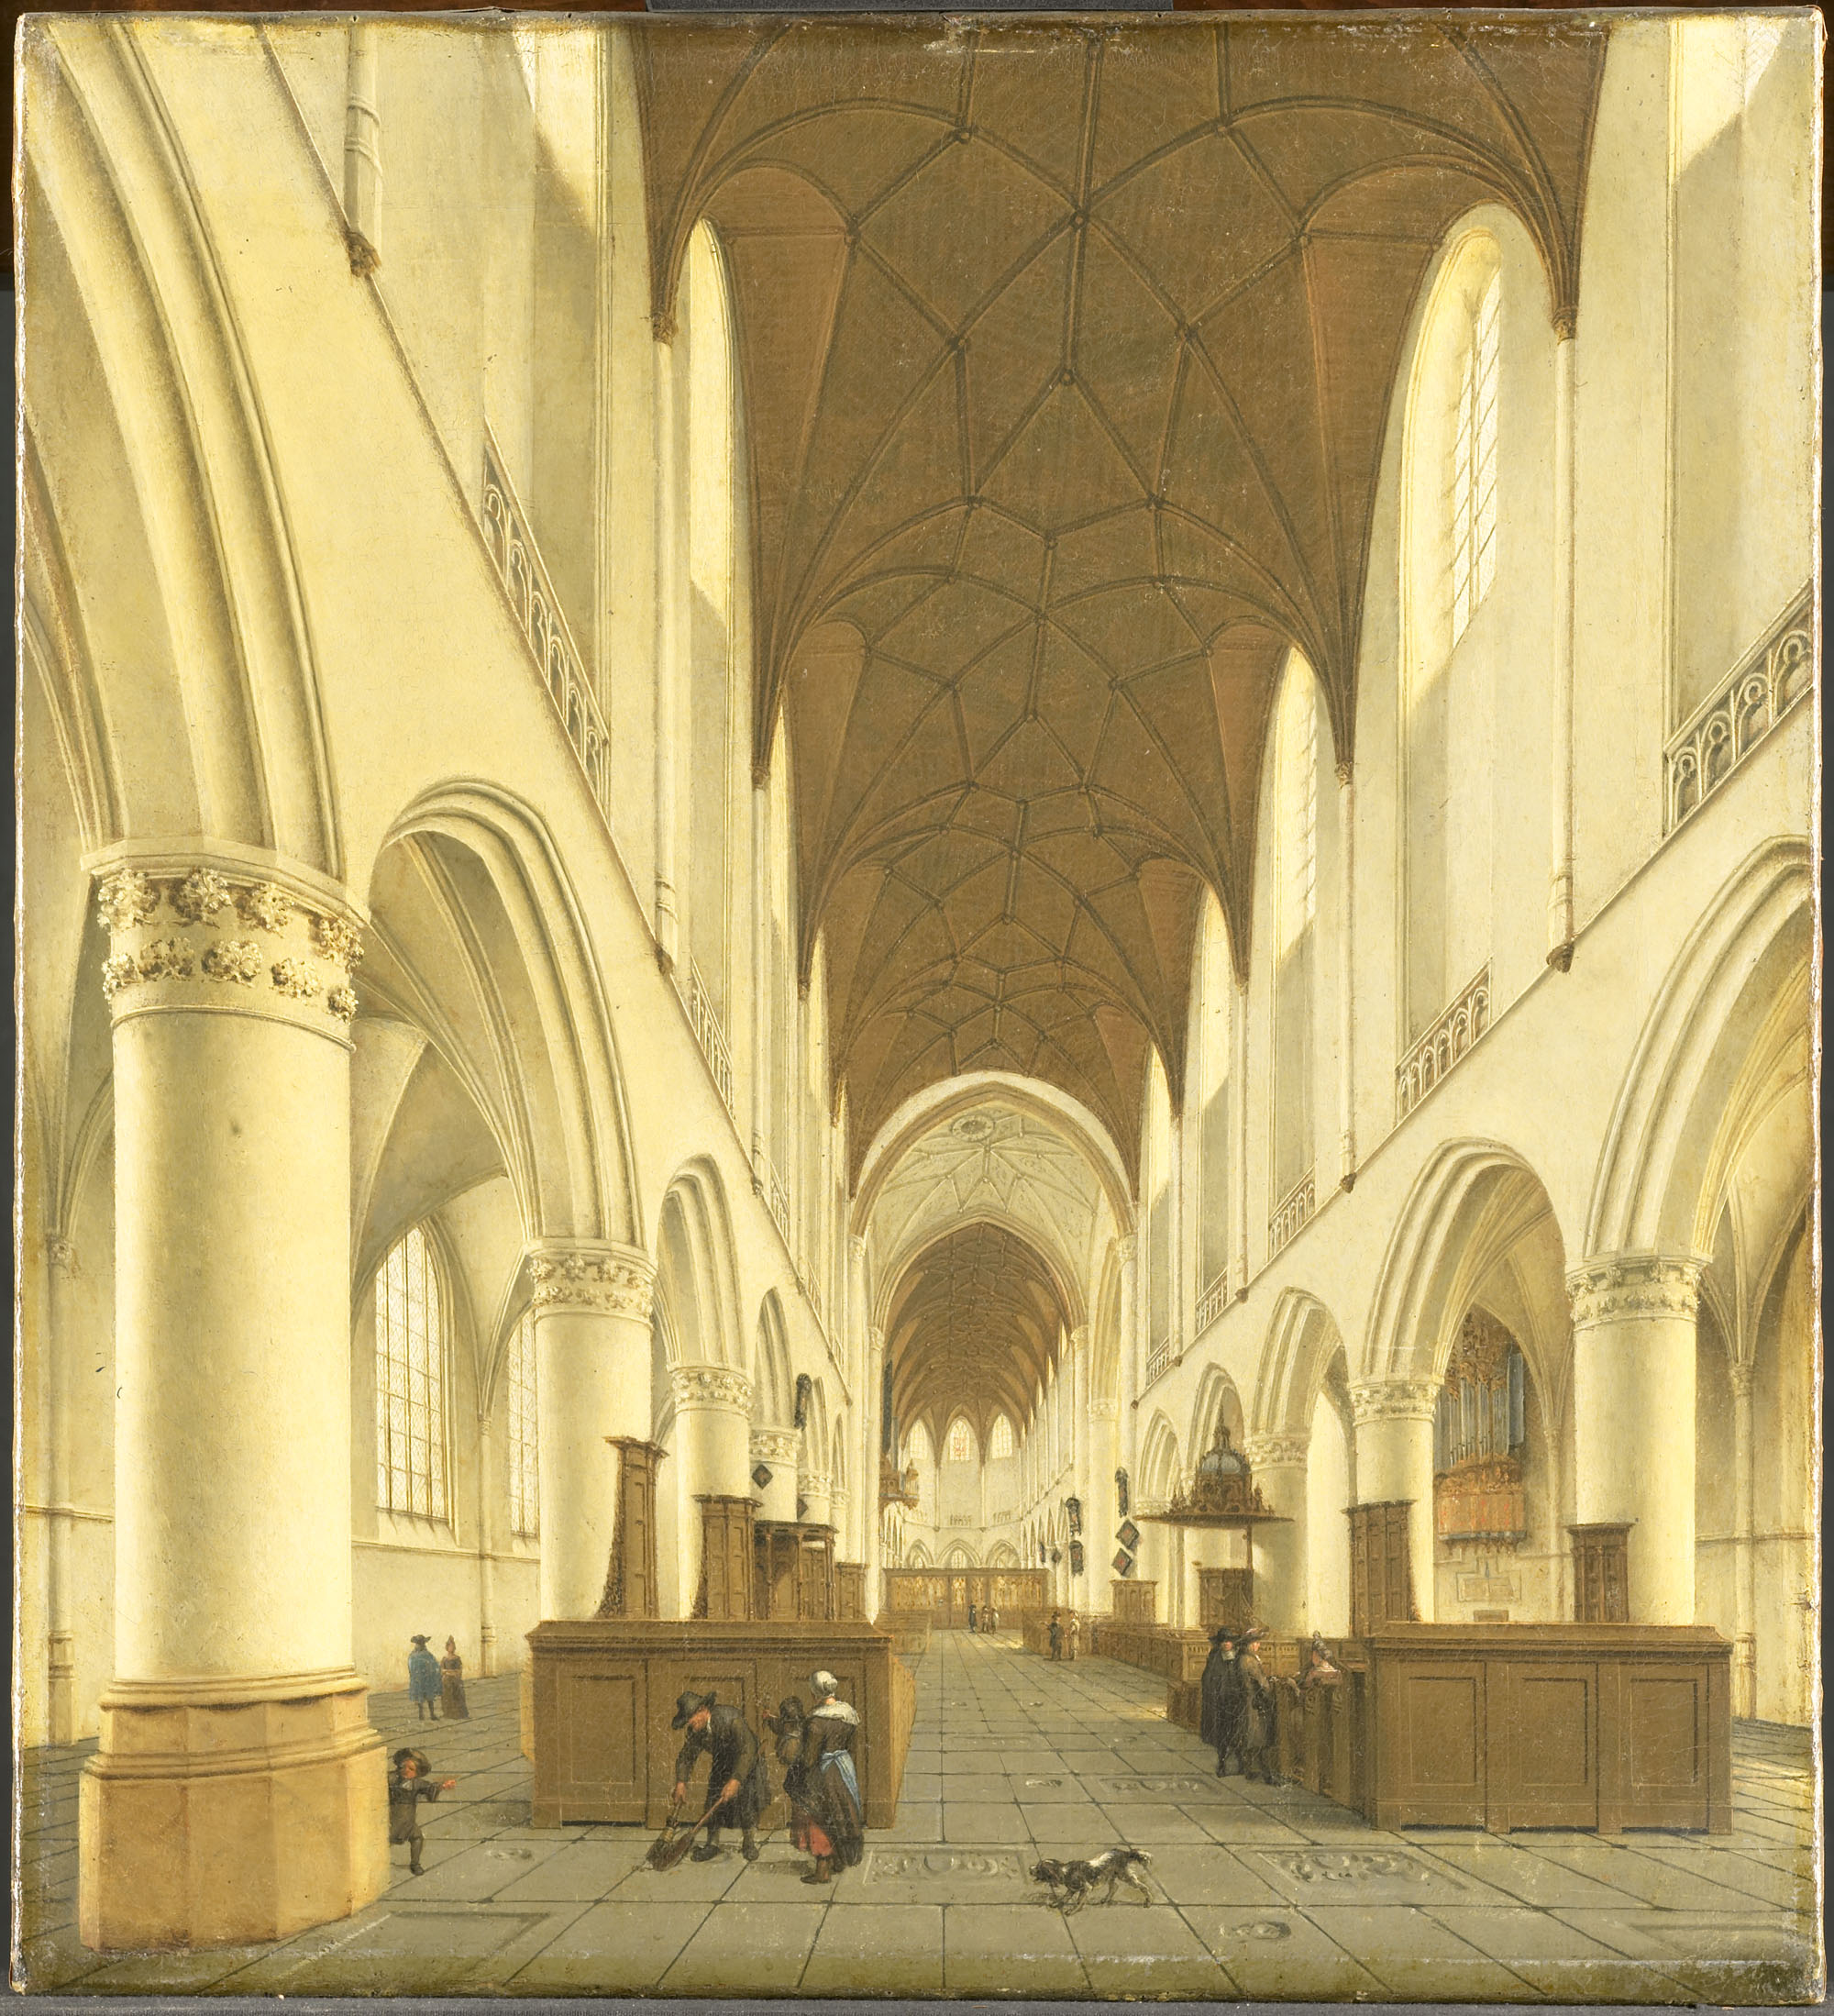 Het interieur van de sint bavokerk te haarlem site title for Interieur haarlem